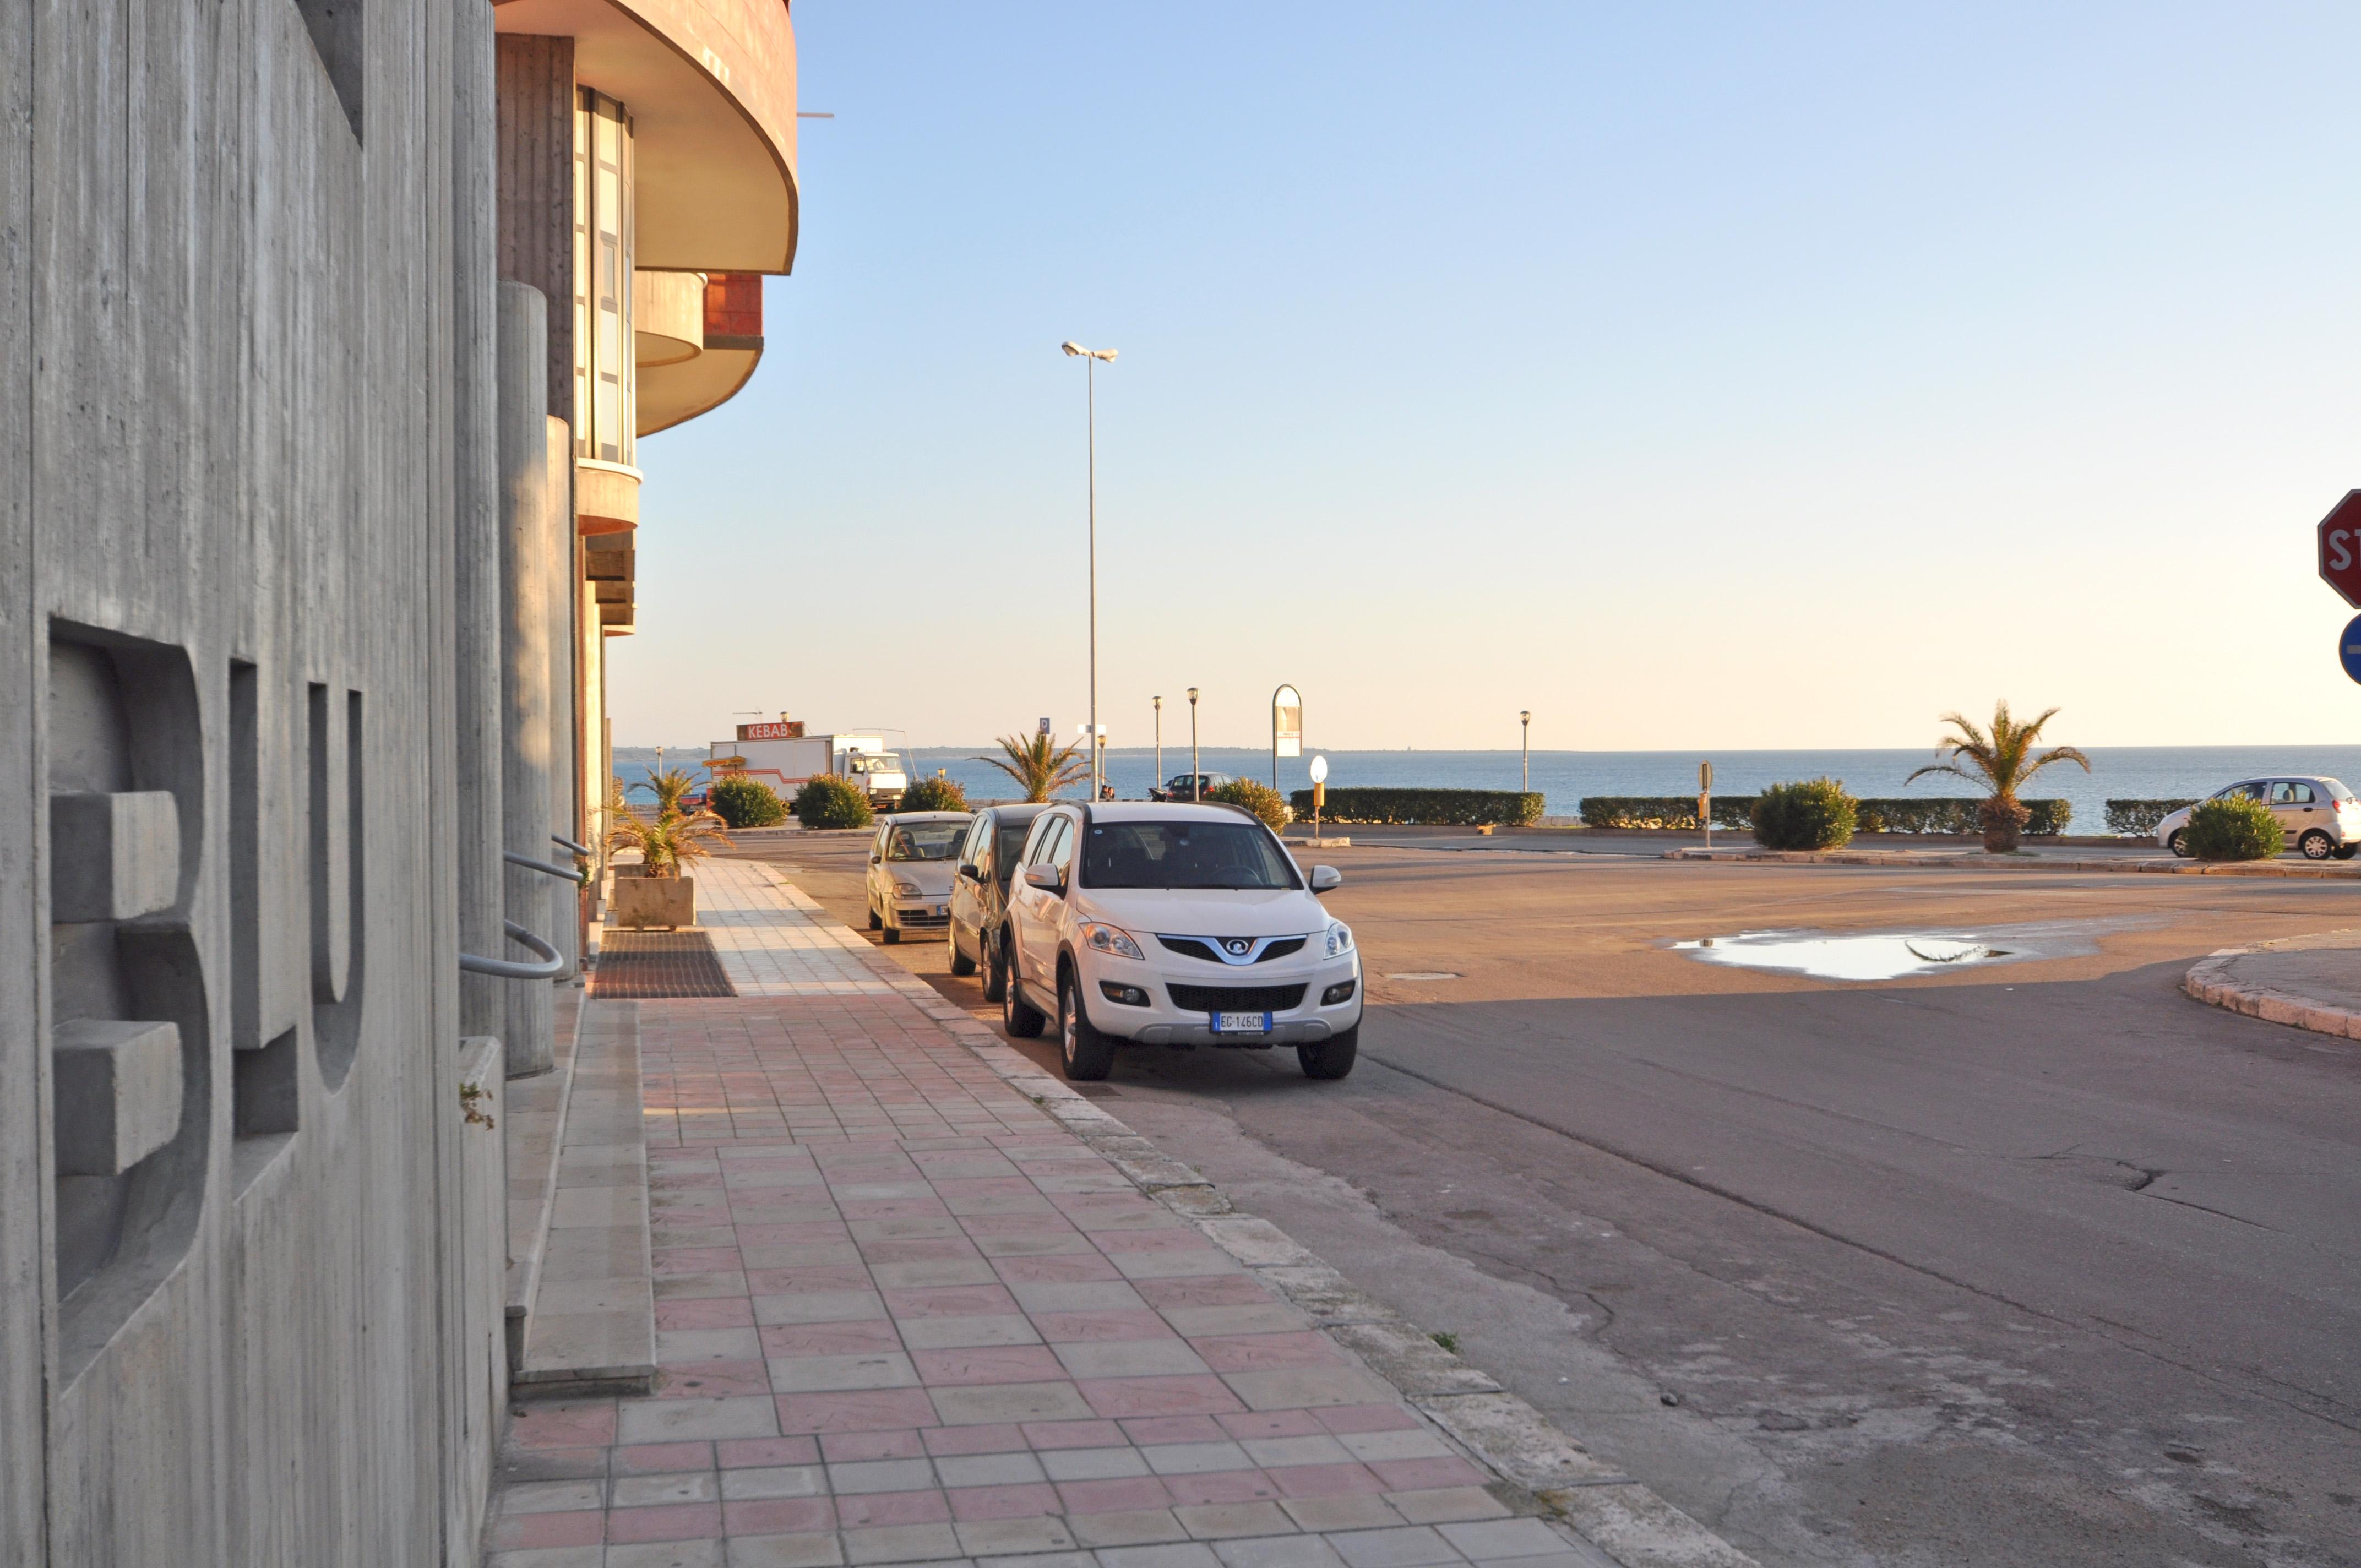 Ferienwohnung Appartamento vista mare a Gallipoli 4/6 posti - Baia Blu Side (2574458), Gallipoli, Lecce, Apulien, Italien, Bild 16